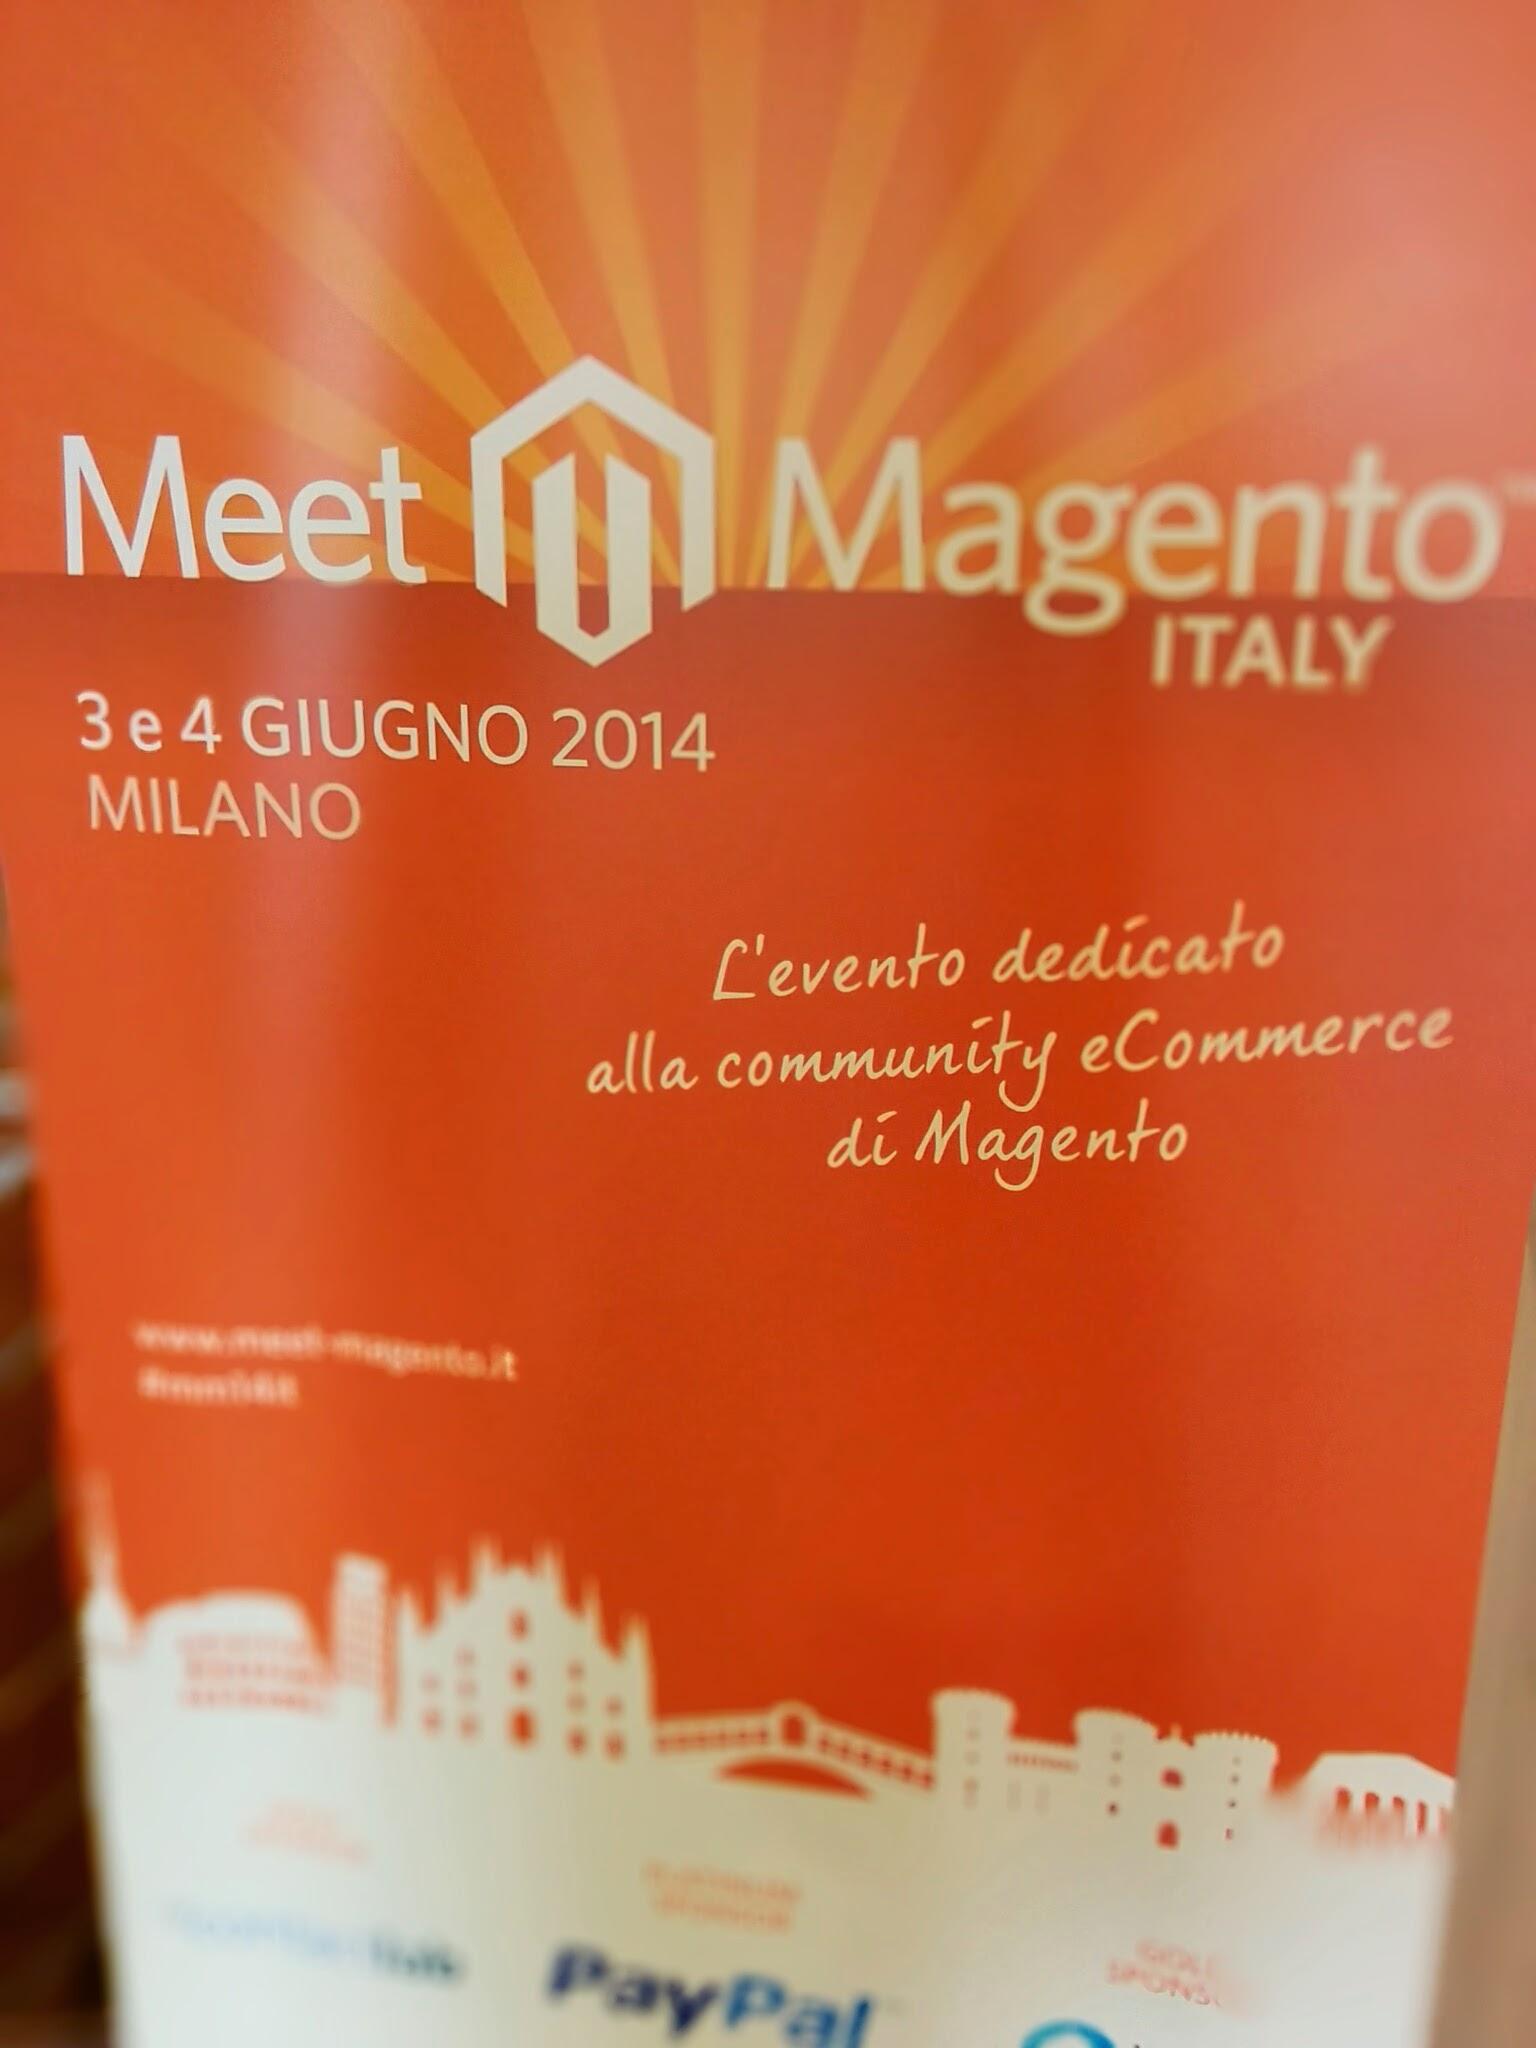 Storia del primo Meet Magento Italia